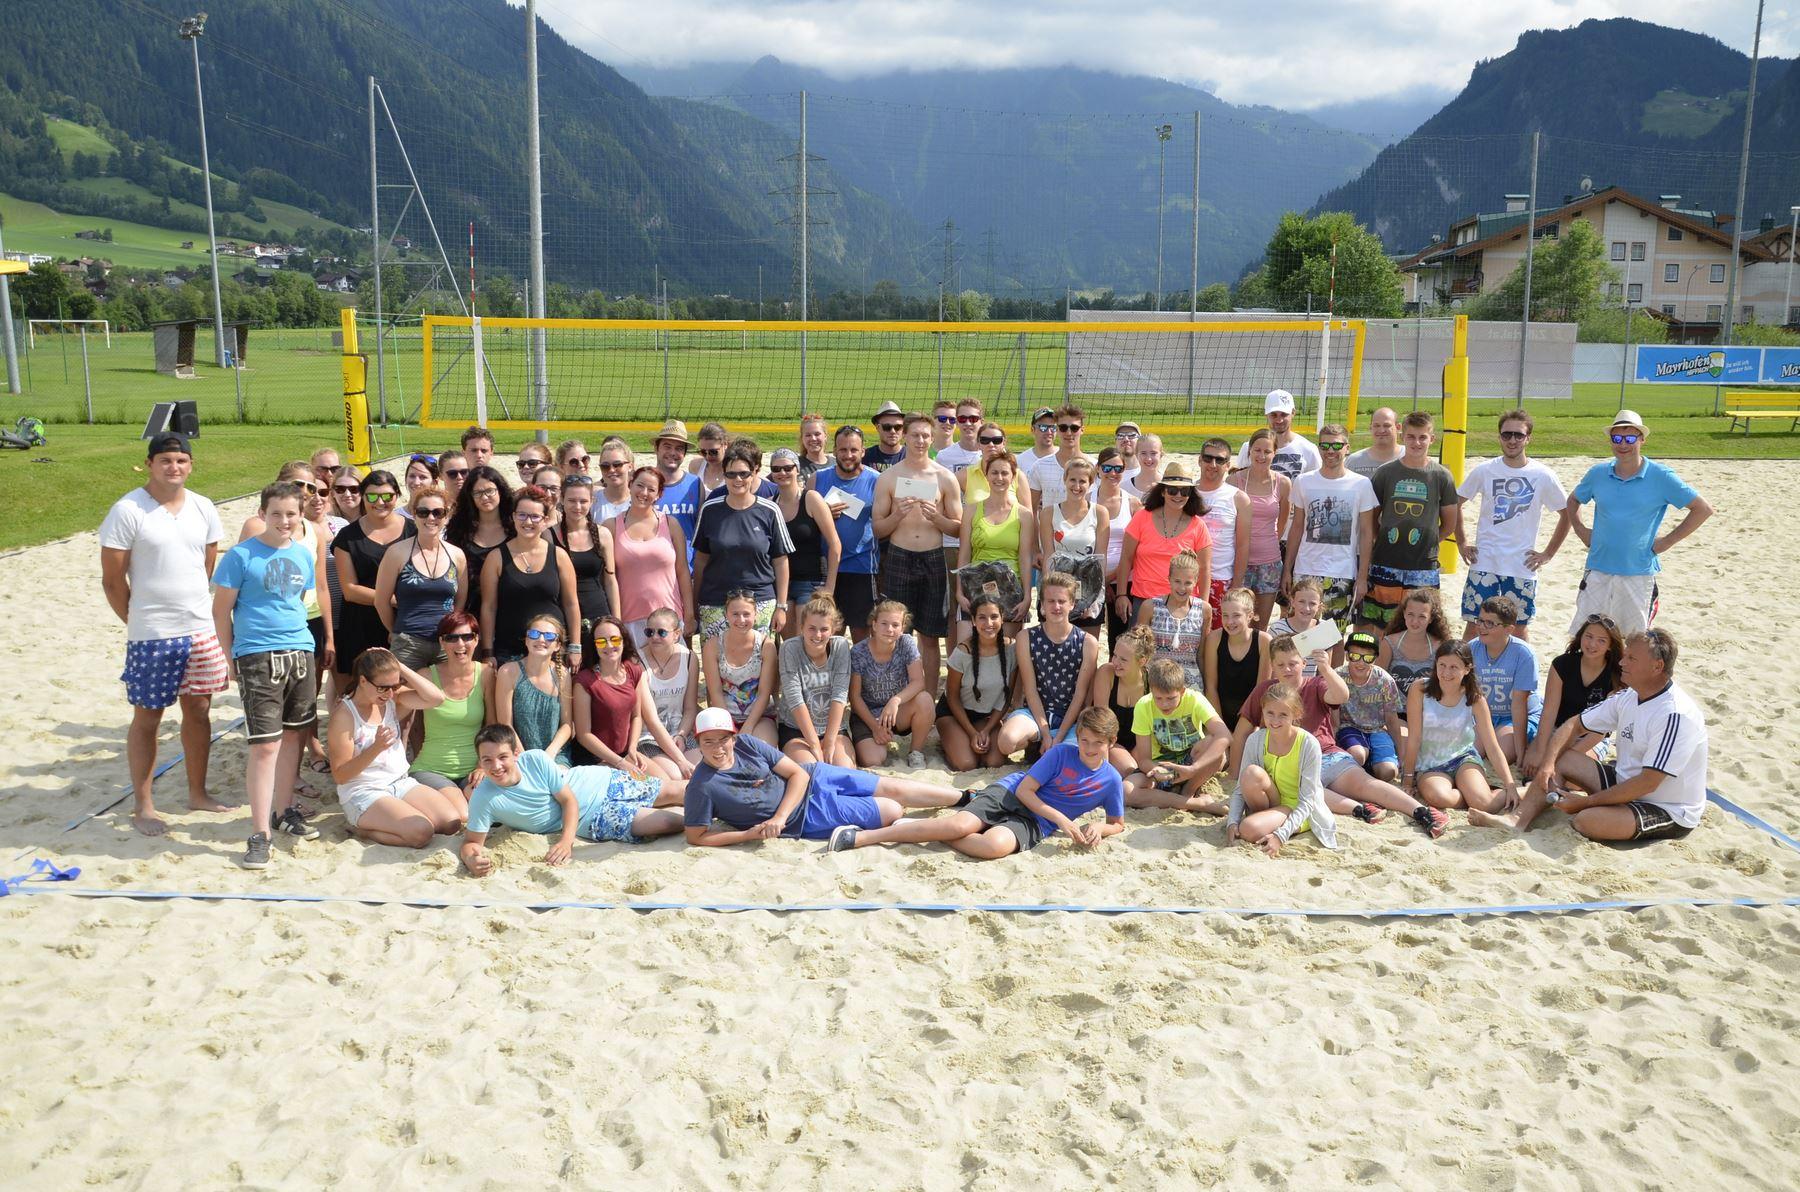 2016-07-02 Beachvolleyball 323